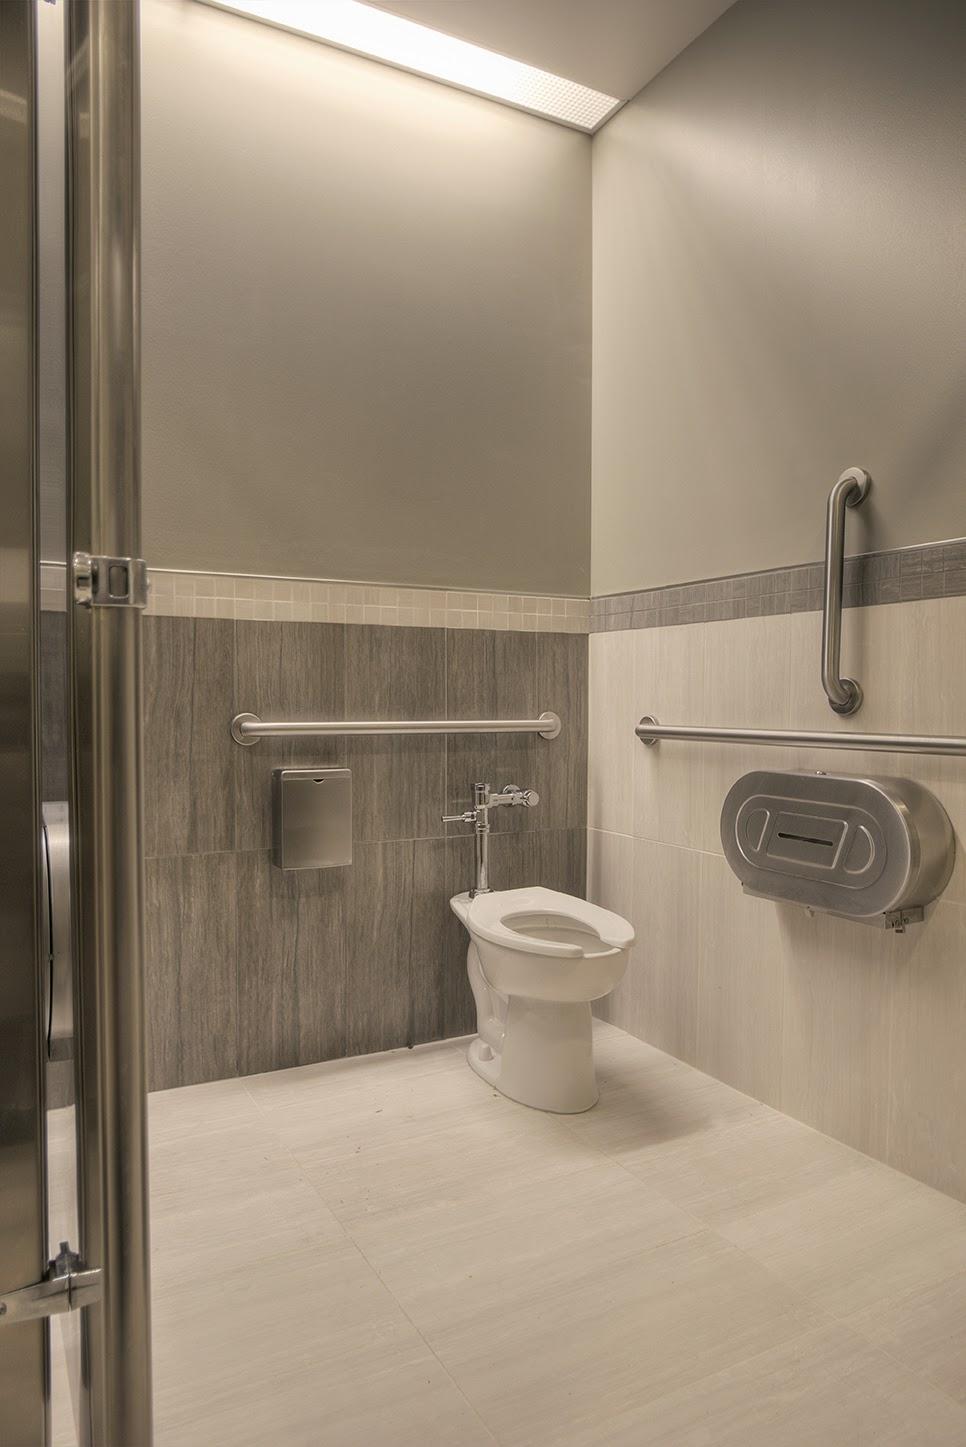 Commercial Bathroom Tiles ~ safemarket.us